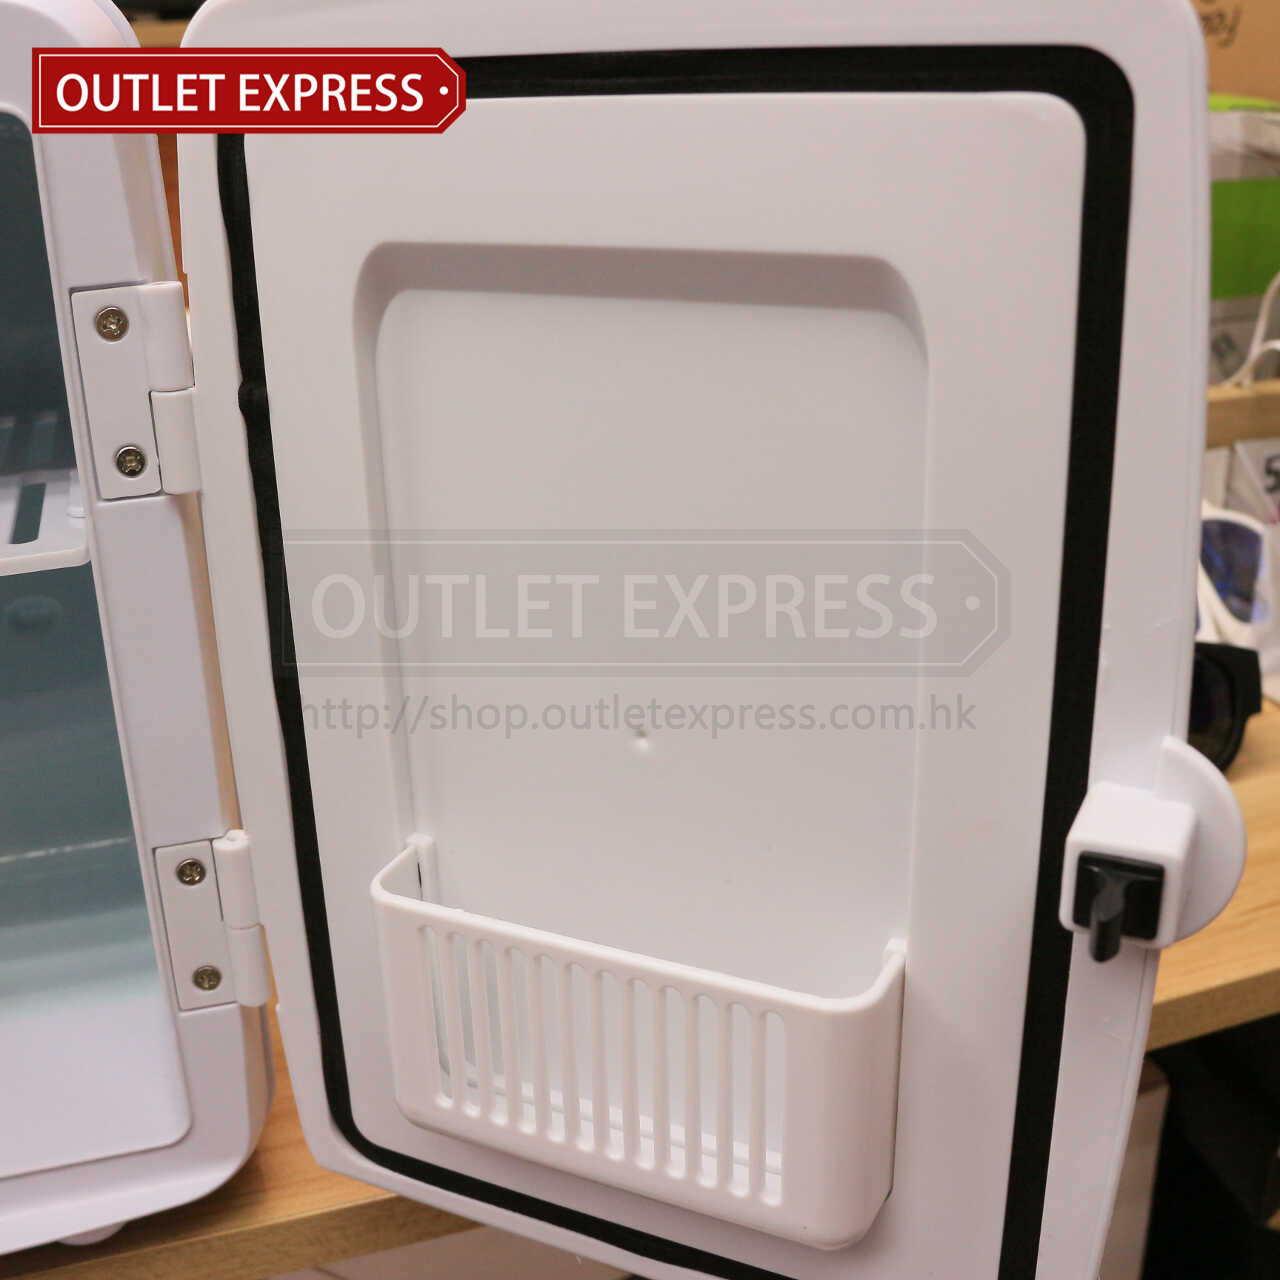 4L 冷暖兩用迷你小雪櫃 | 可車載或家用 雪櫃門- Outlet Express HK生活百貨城實拍相片